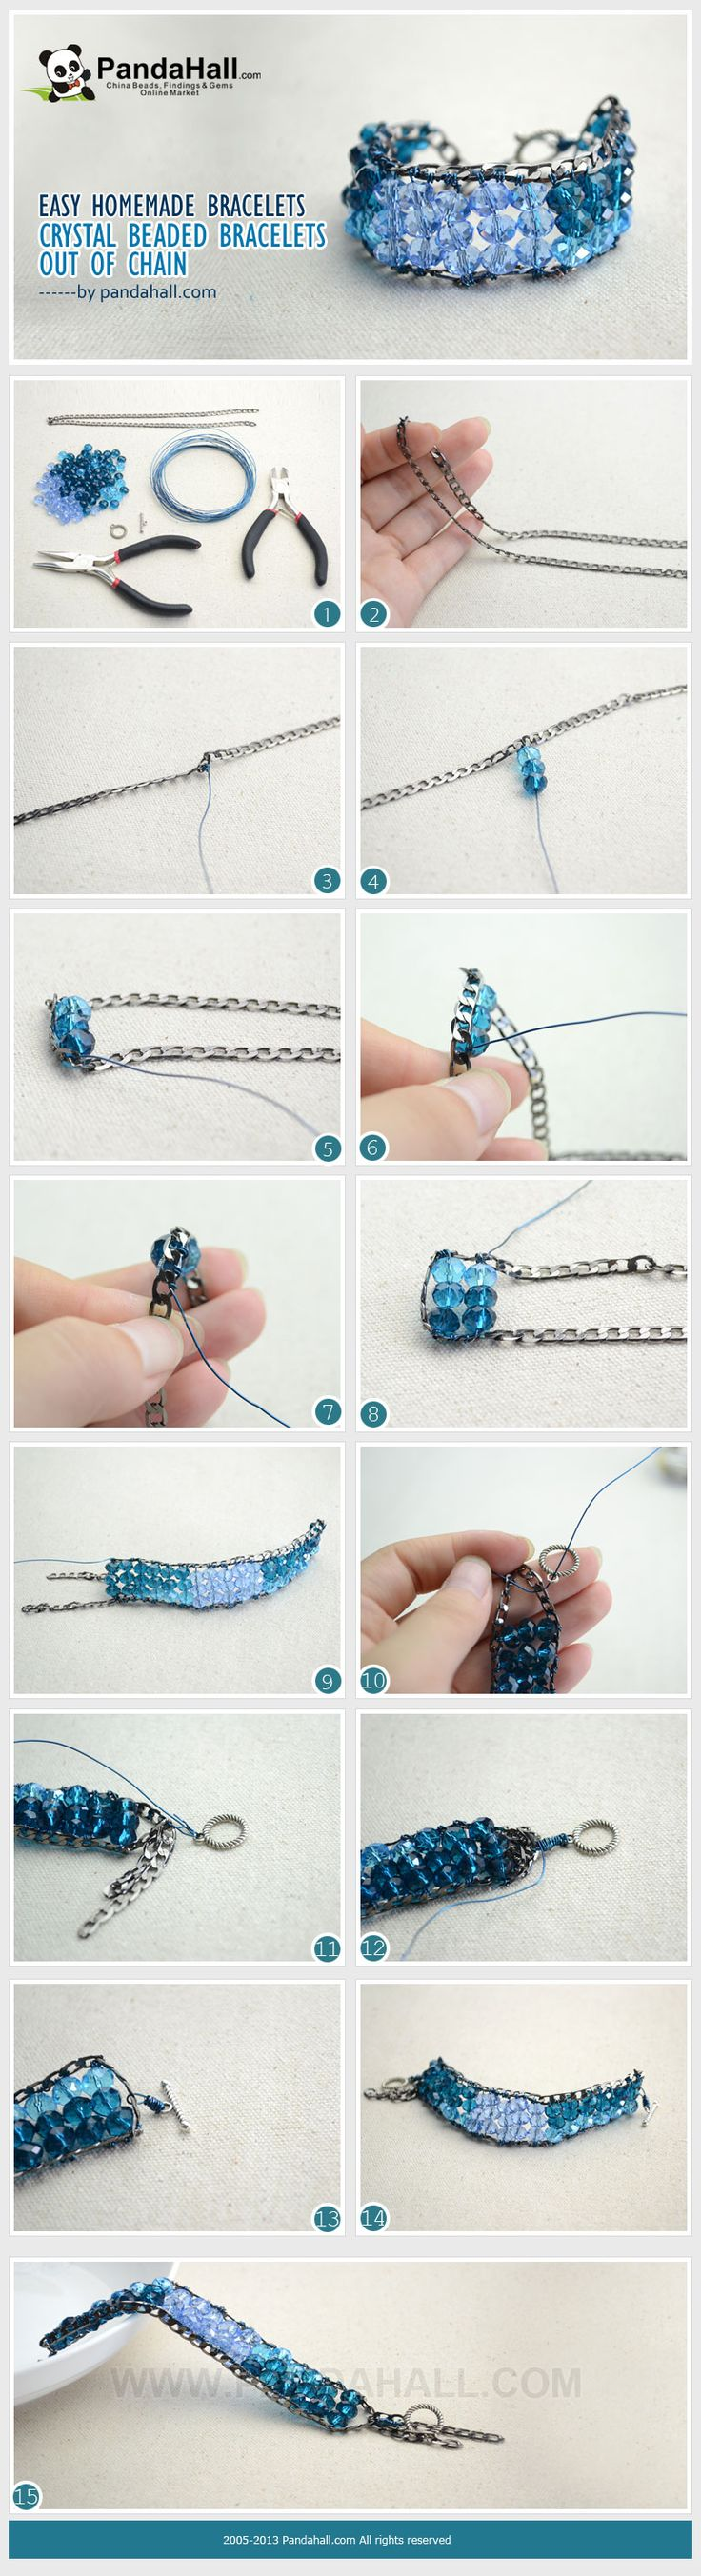 Easy Homemade Bracelets-Crystal Beaded Bracelets out of Chain from pandahall.com